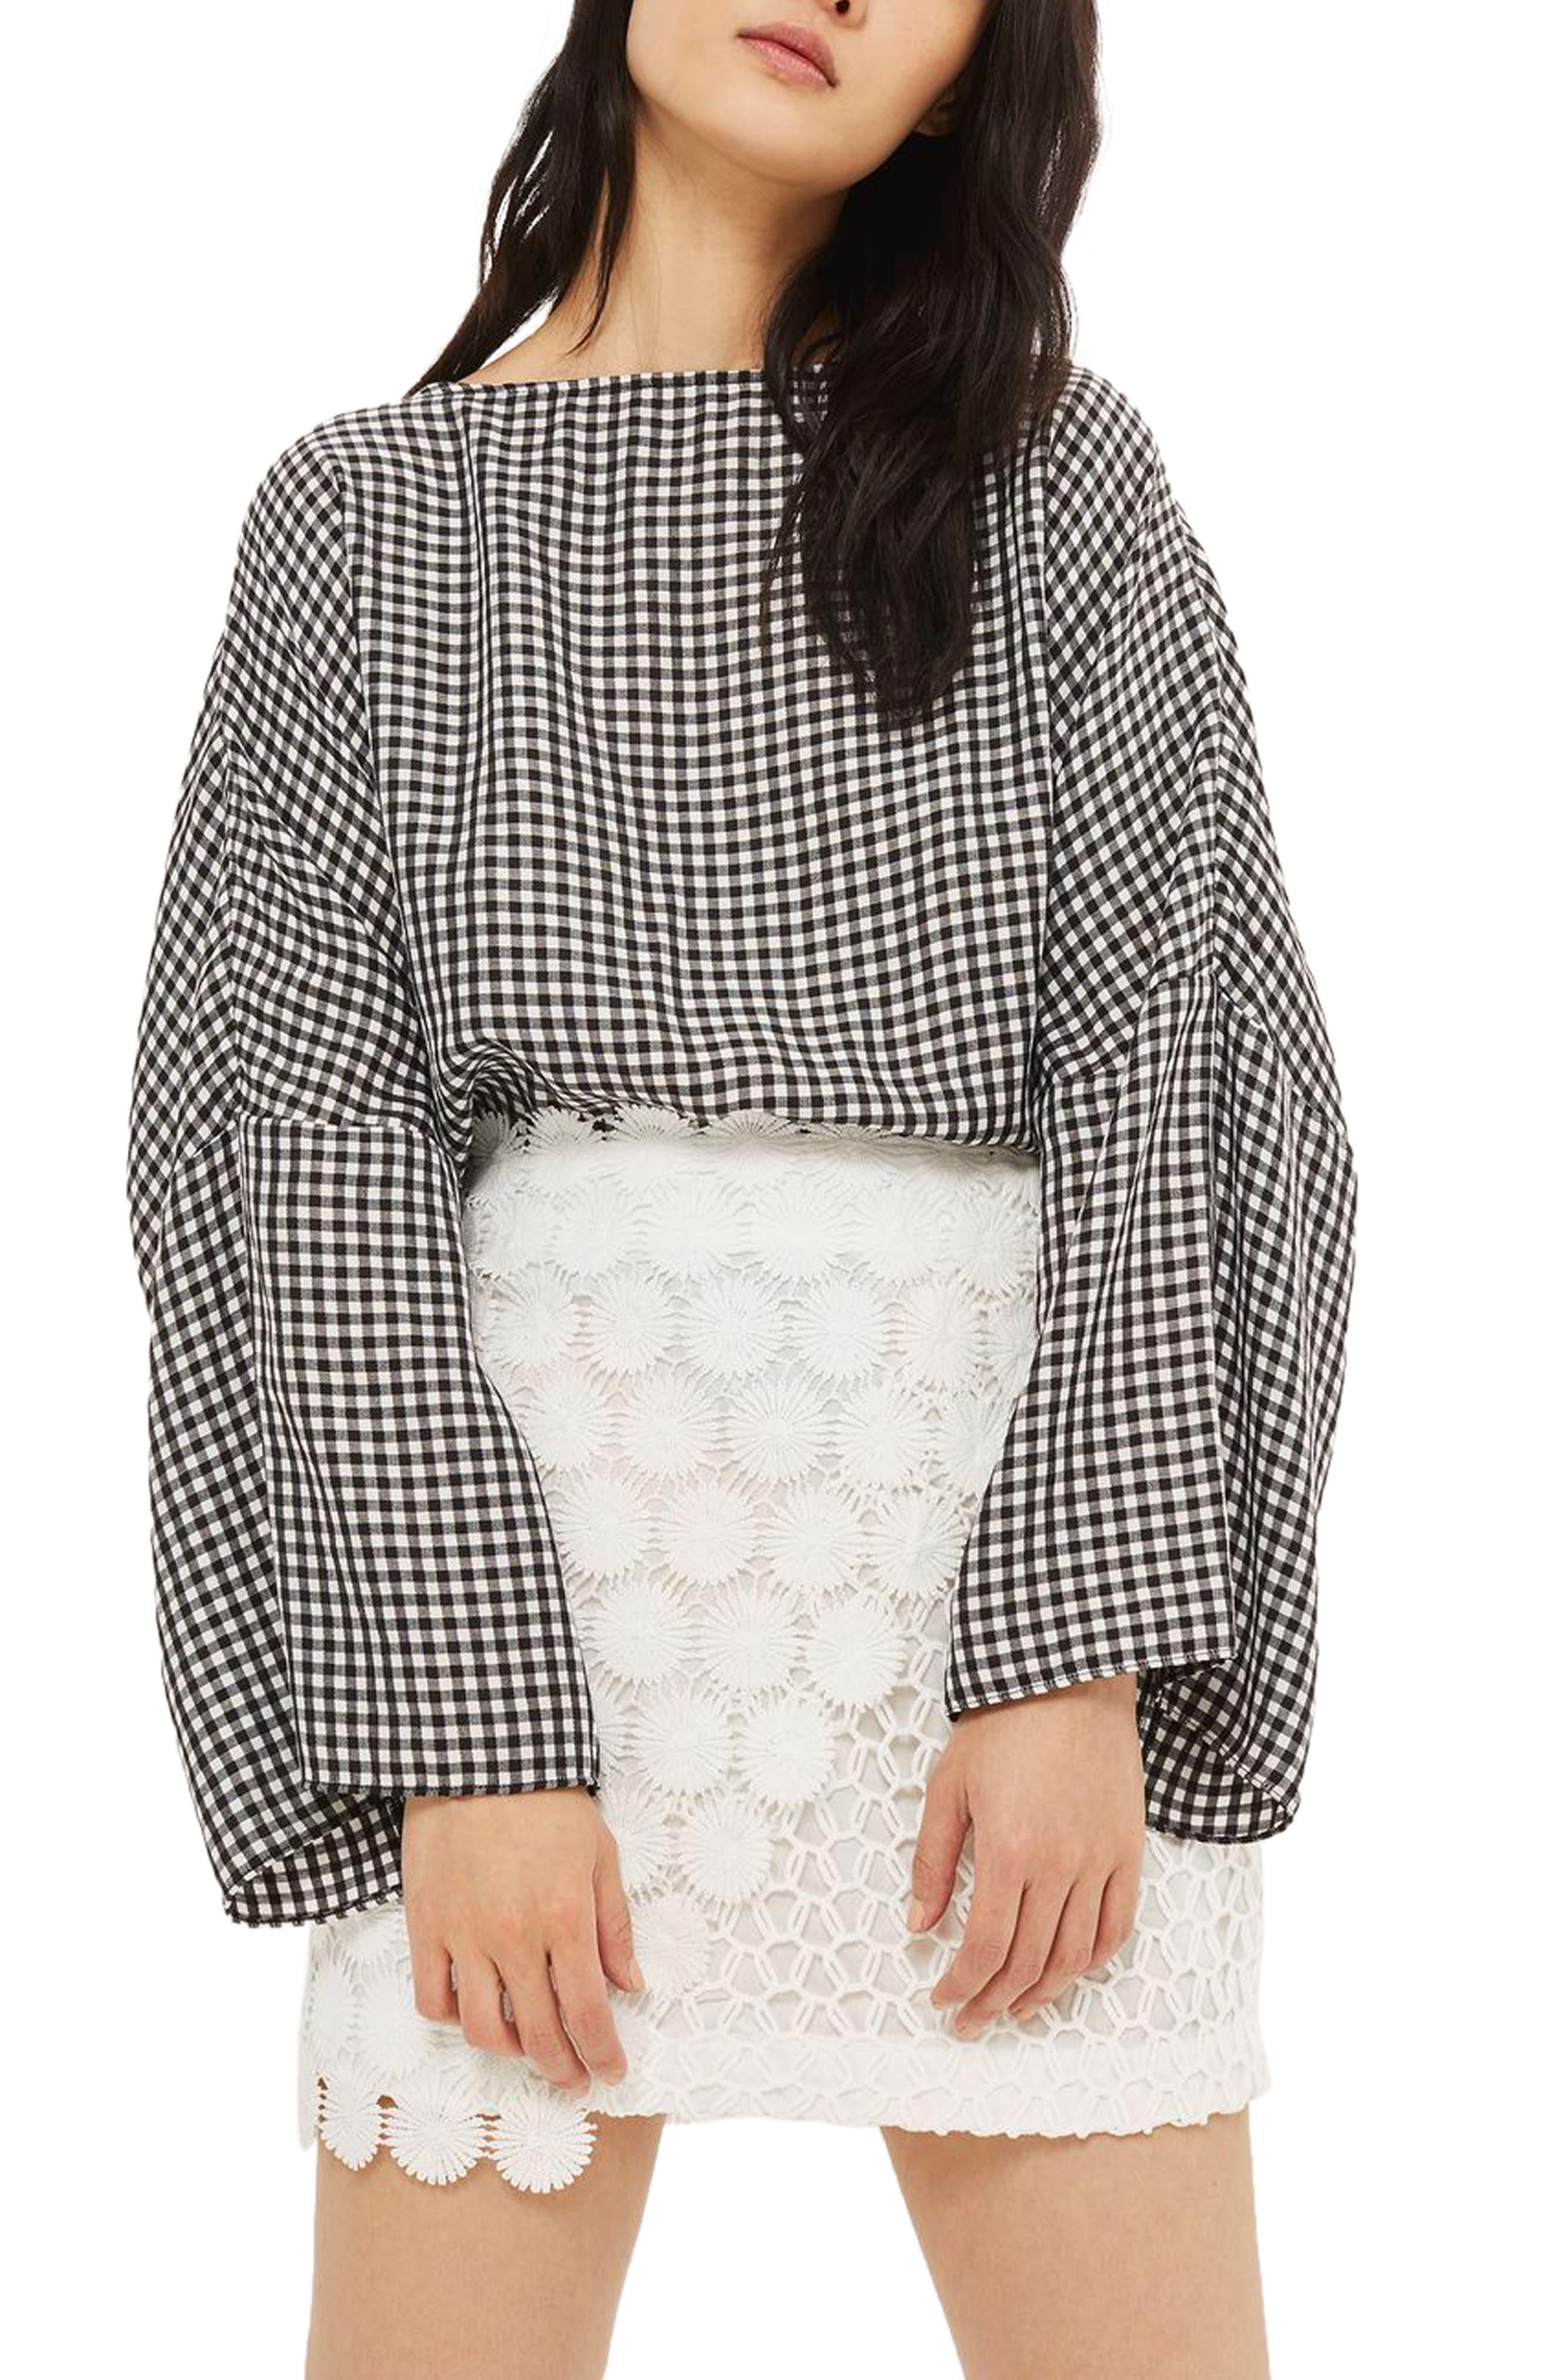 Topshop Rosie Mix Lace Miniskirt